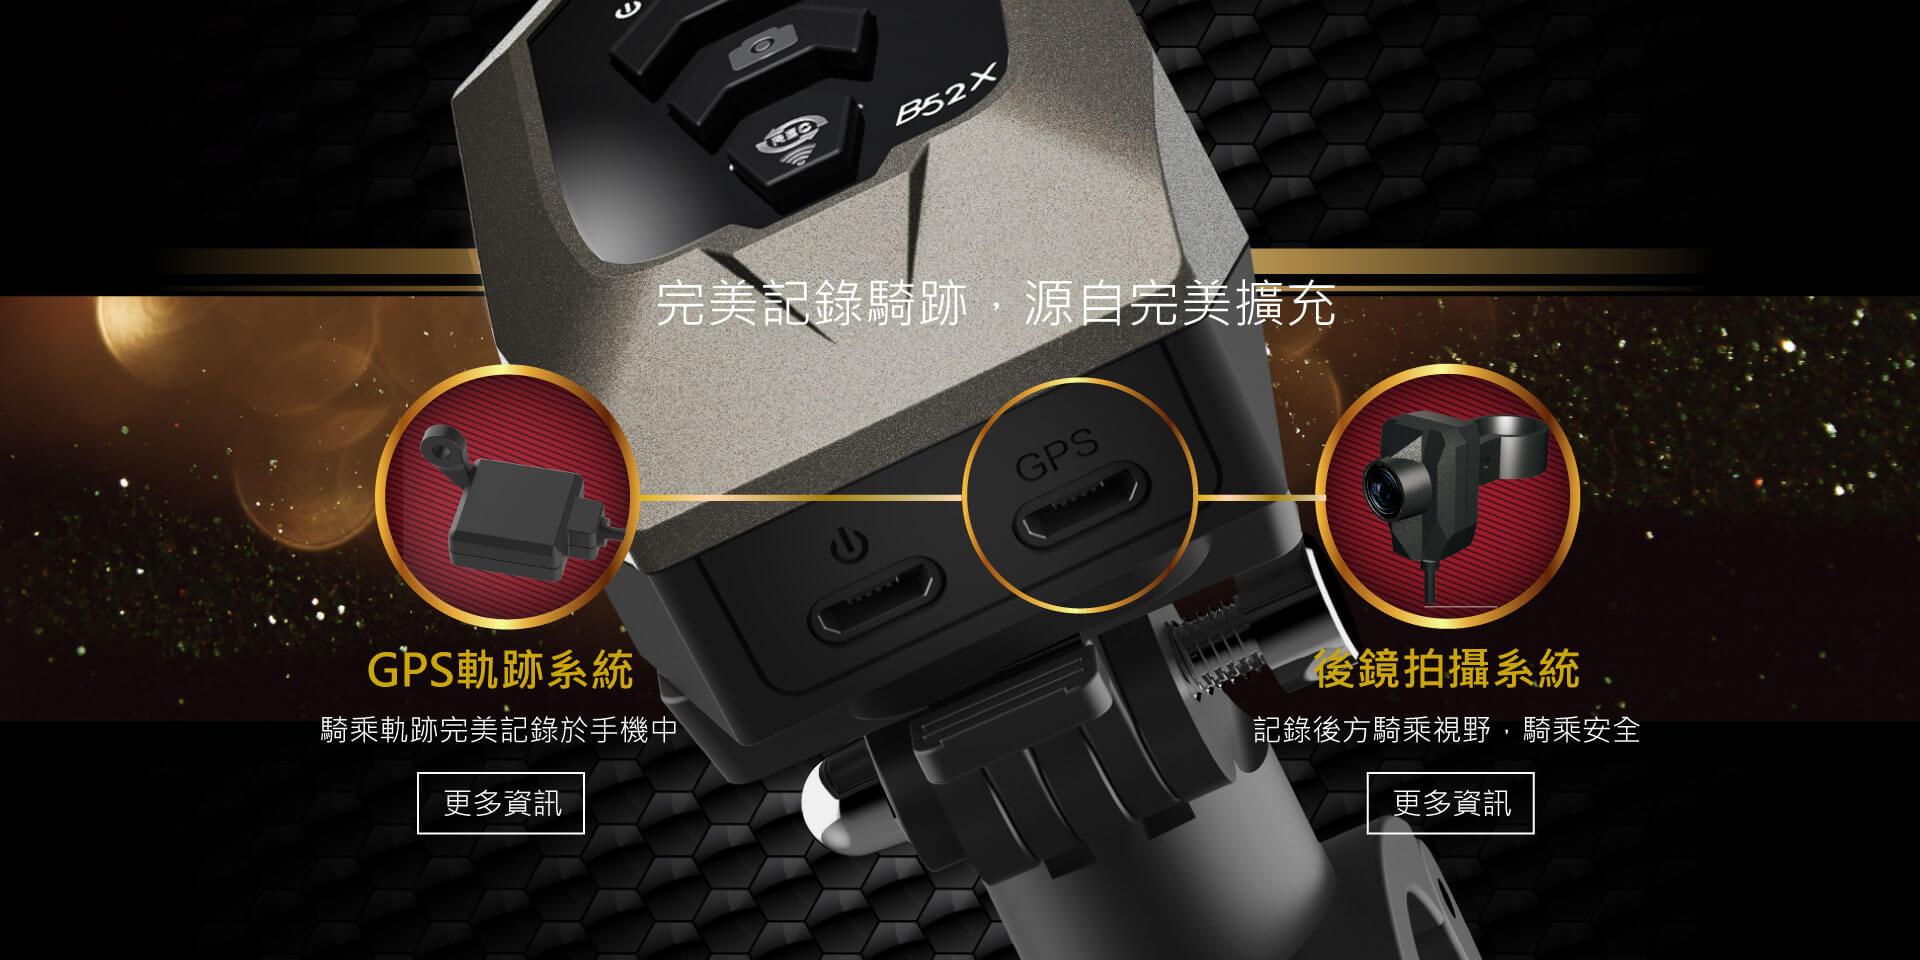 proimages/product/pro-01/pro-01-002/B52X/B52X-17.jpg